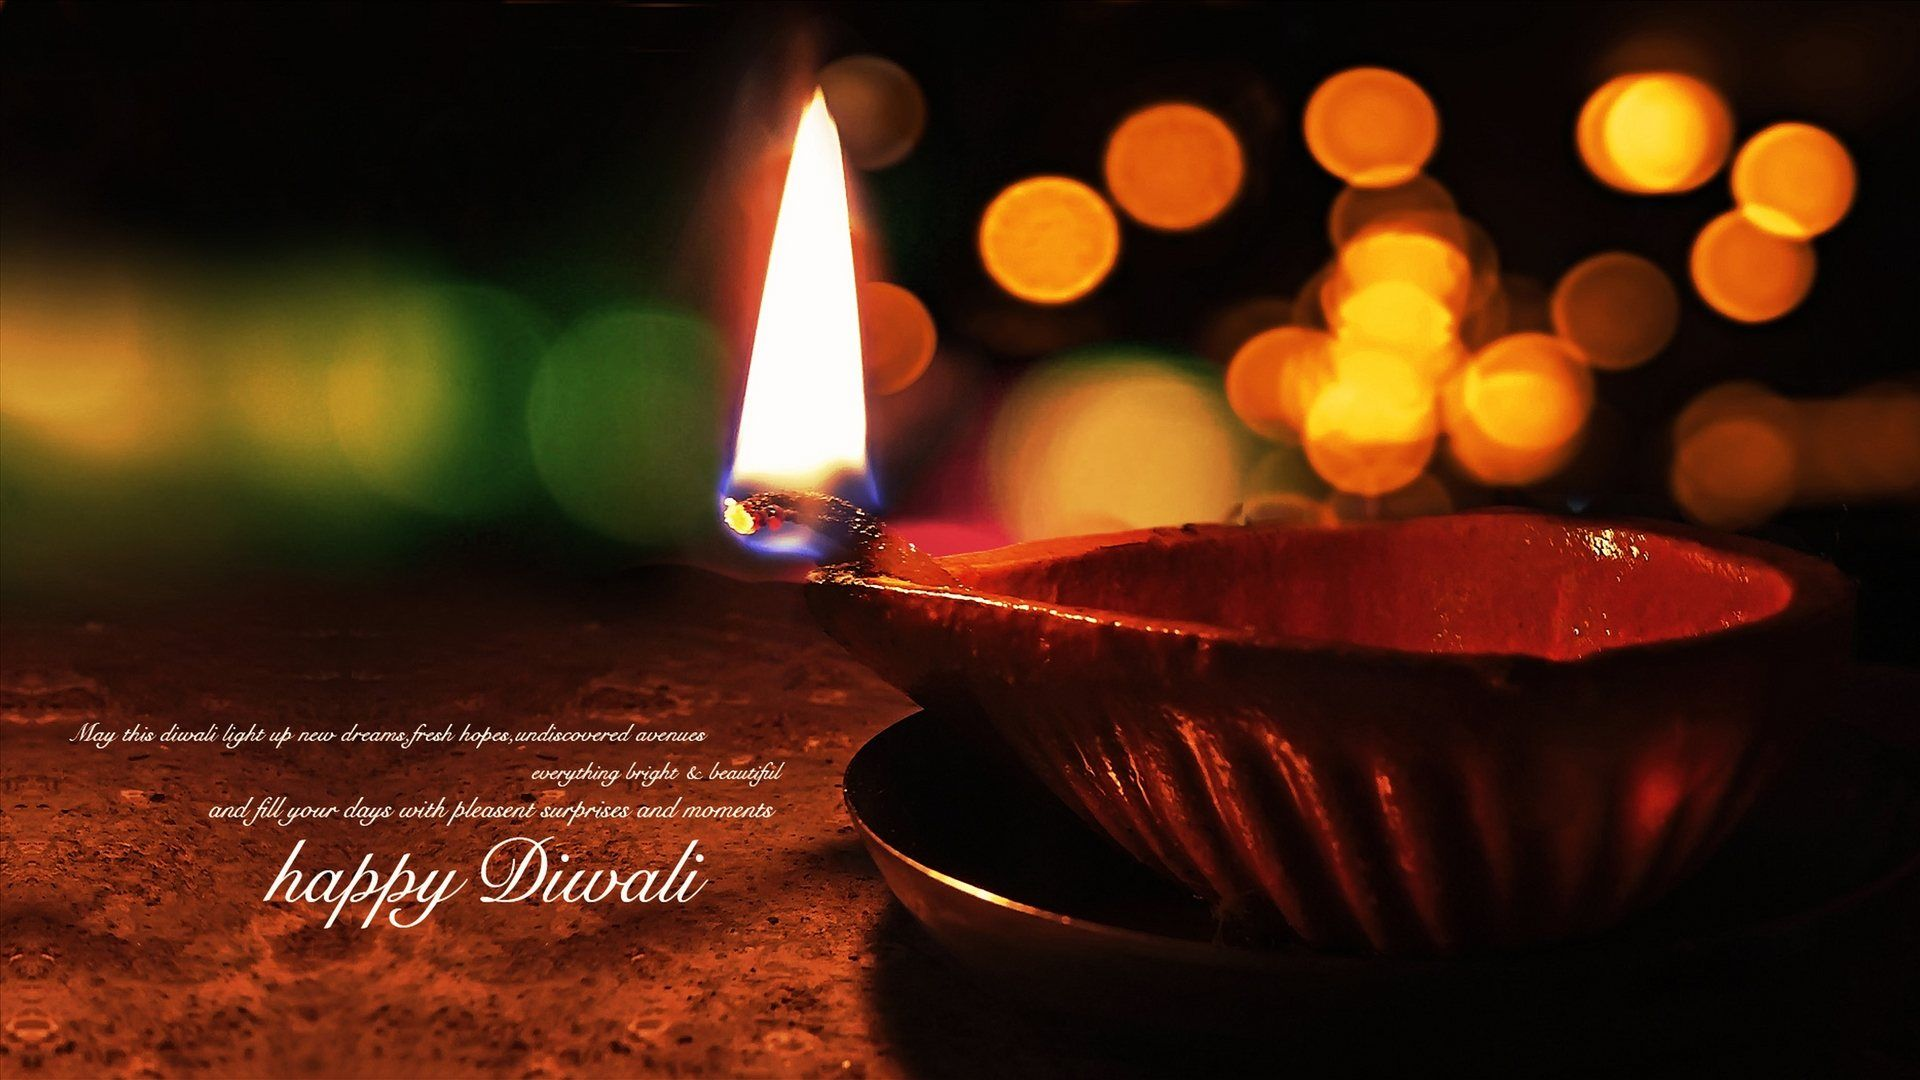 Diwali wallpaper hd dailywallpaperste284829g 19201080 50 beautiful diwali greeting cards design and happy diwali wishes kristyandbryce Choice Image